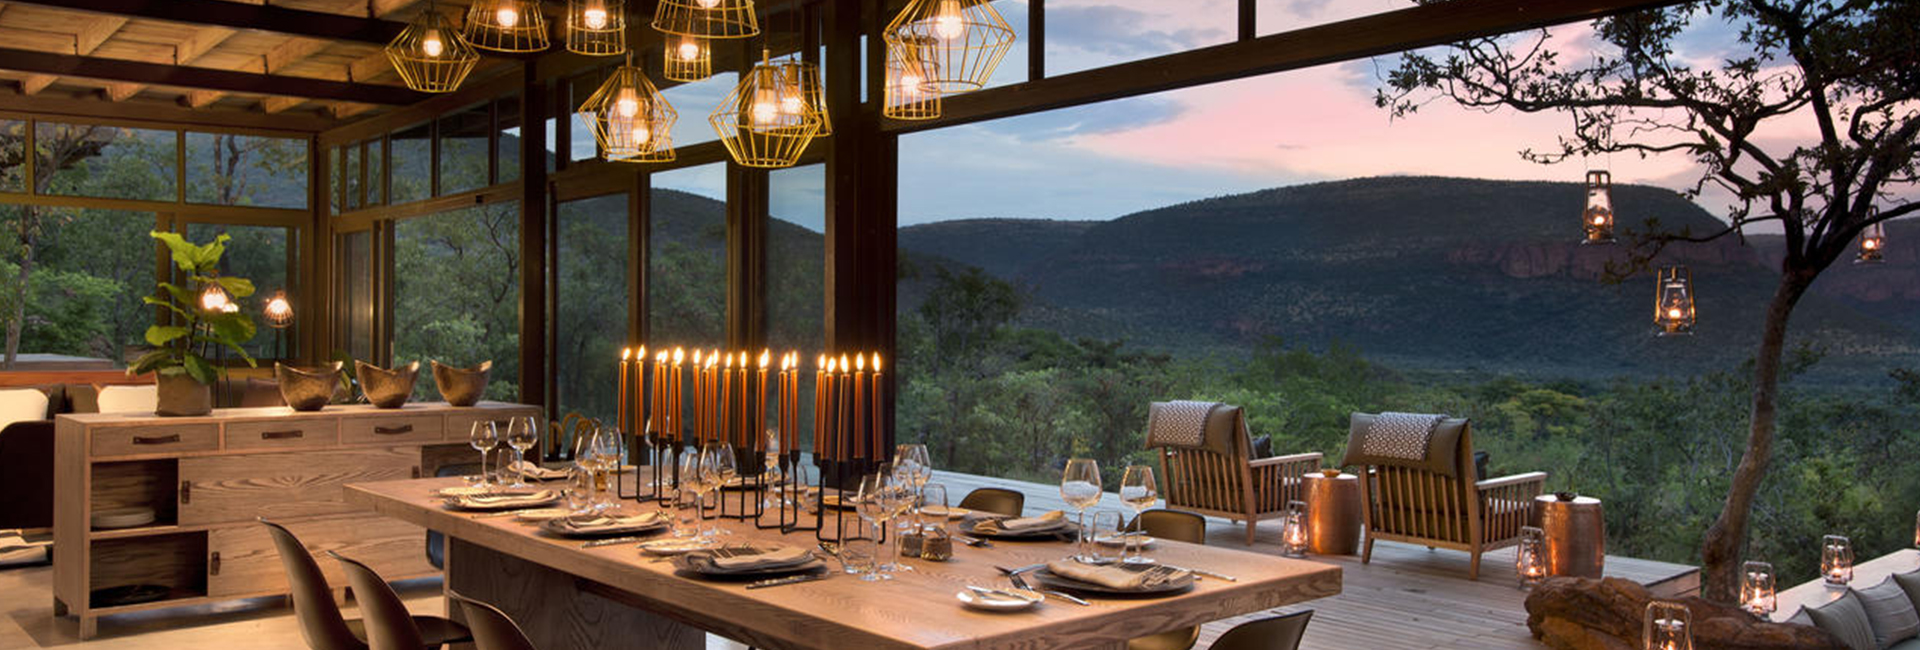 Marataba Trails Lodge Waterberg Dining